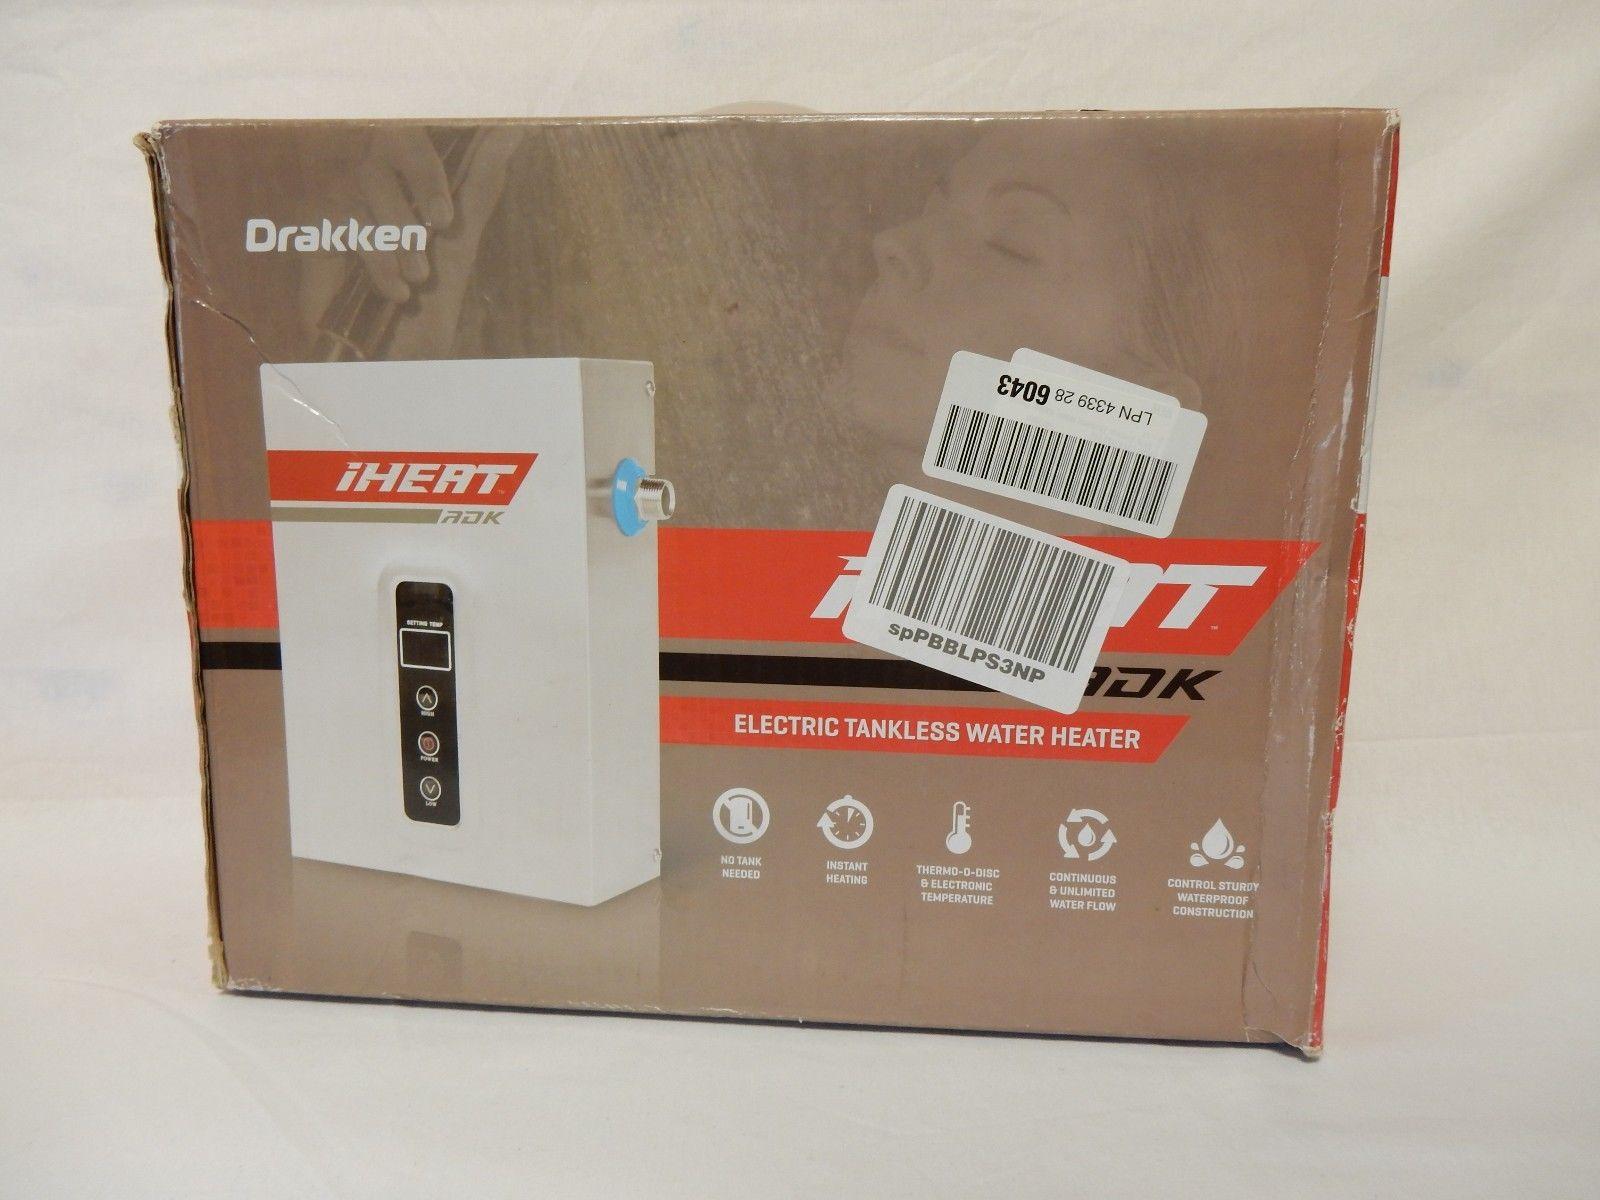 tankless water heater packaging